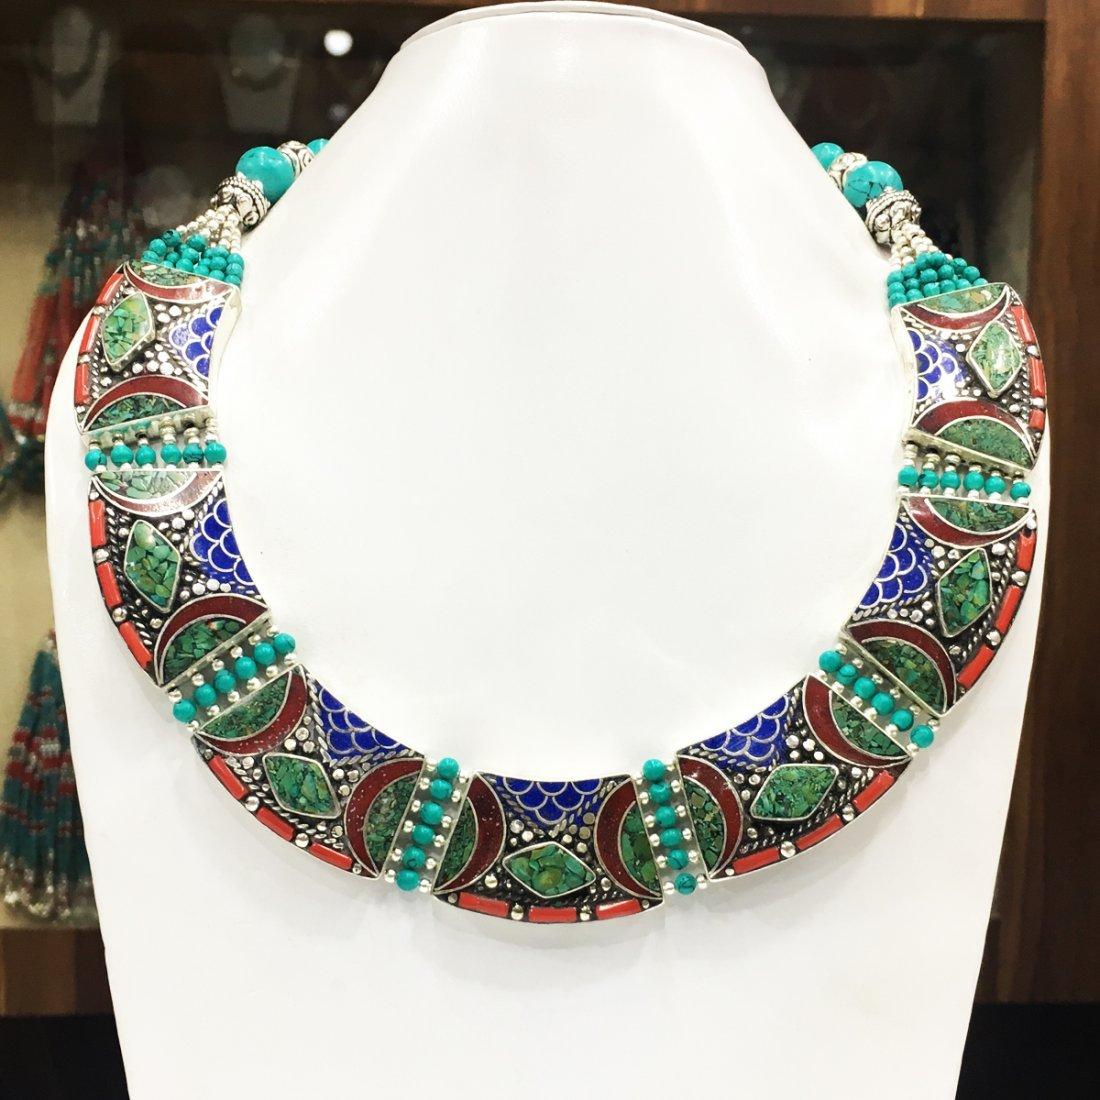 Tibetan Nepalese Handmade Turquoise Necklace